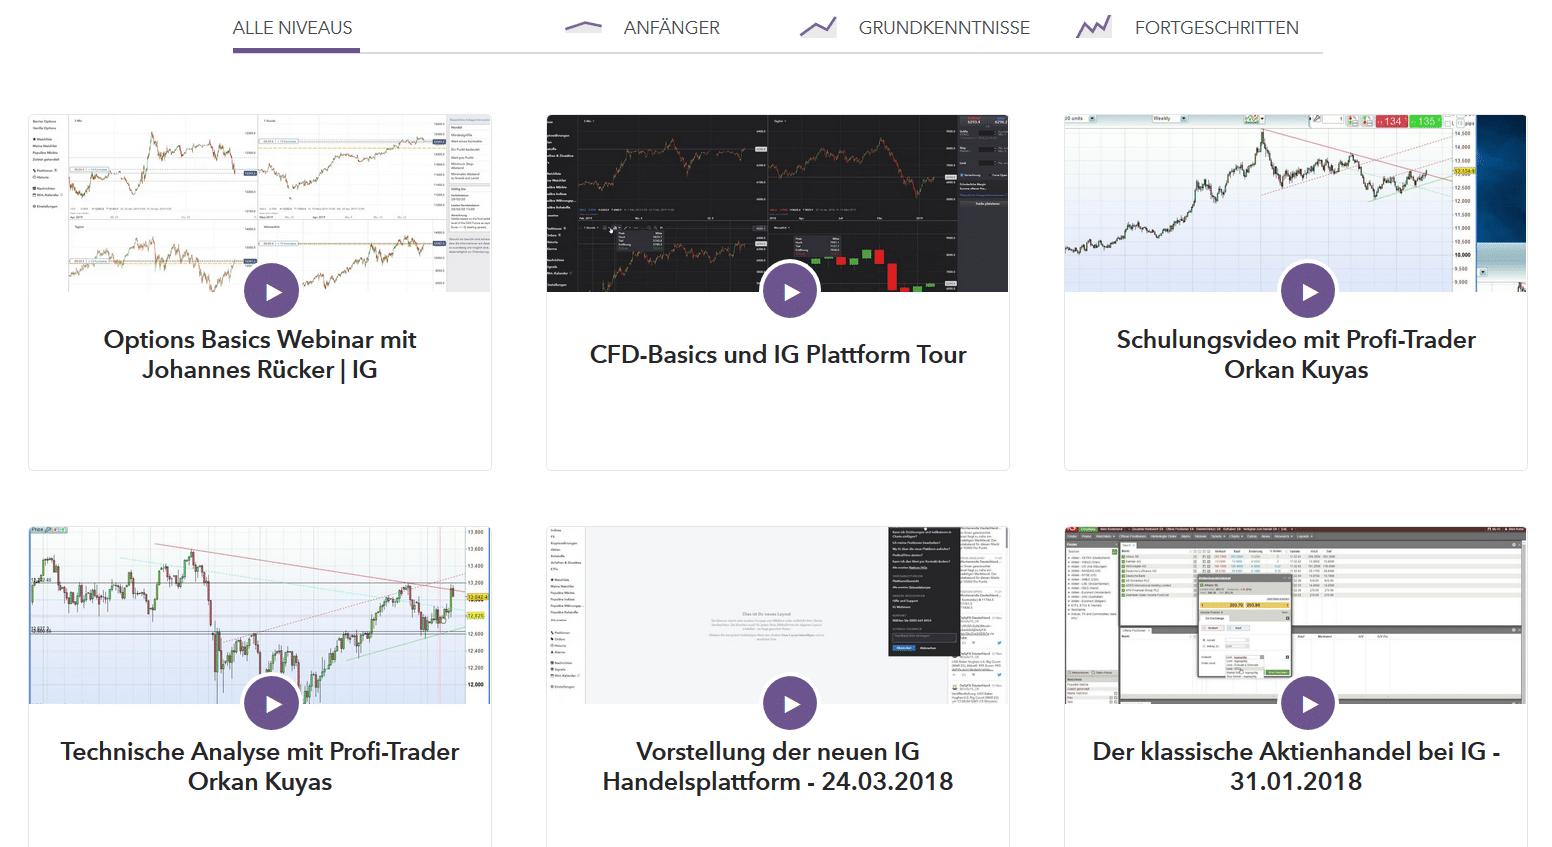 Archiv der IG Markets Webinare